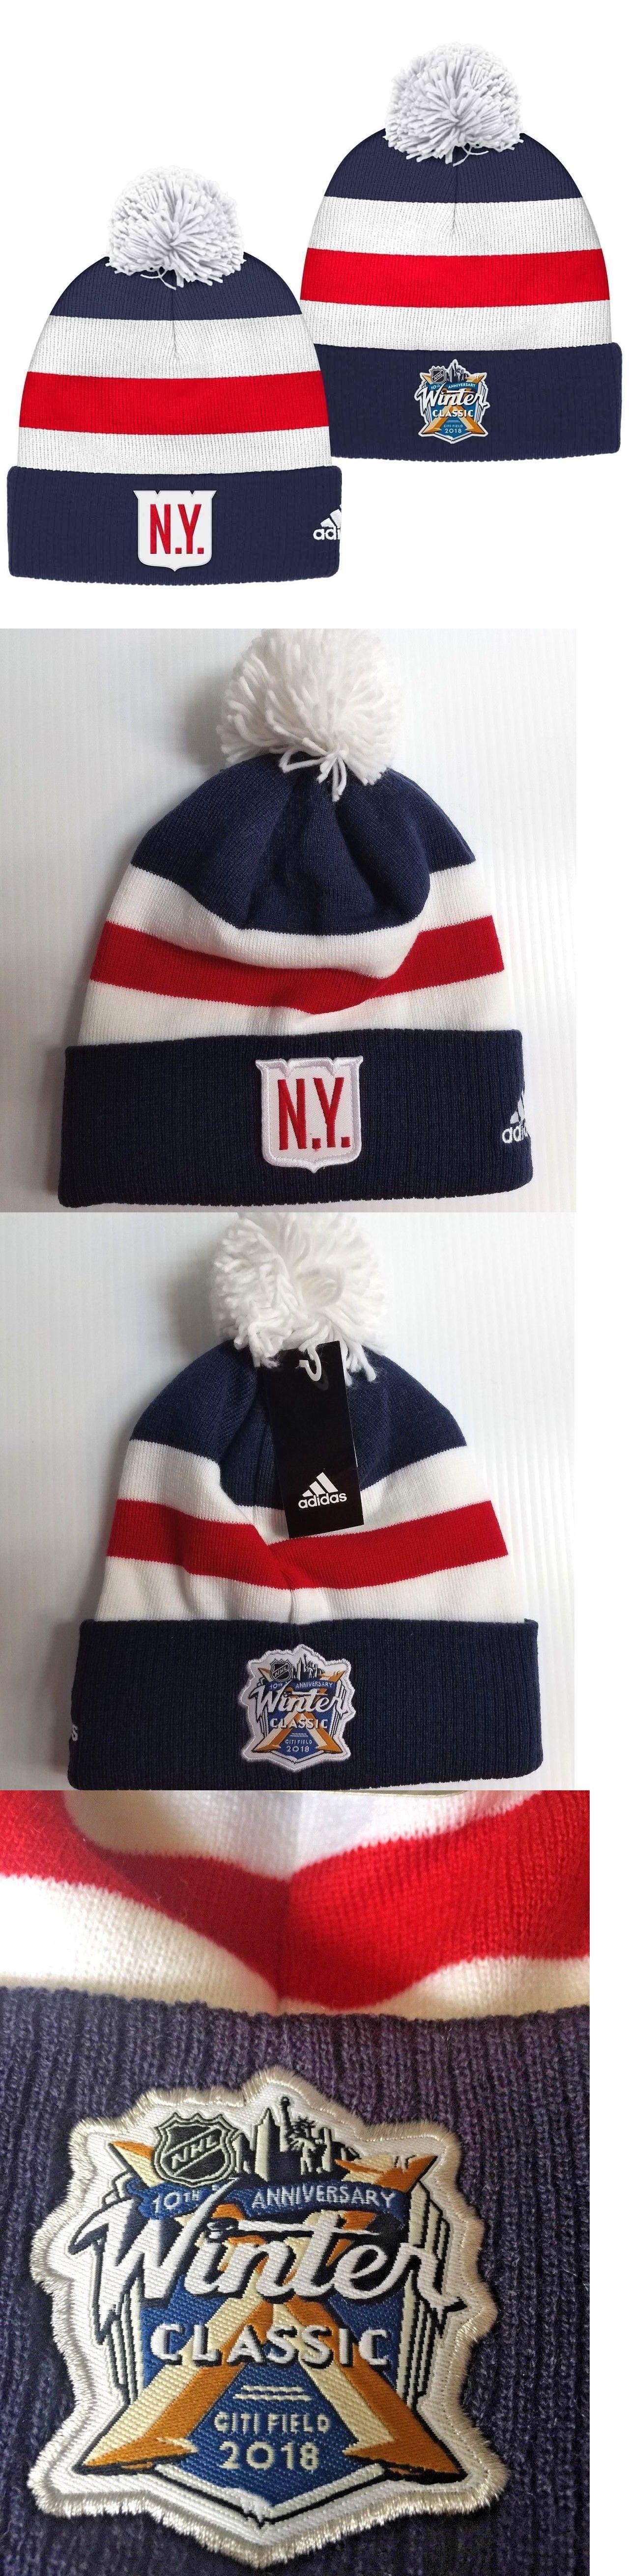 Hockey-NHL 24510  New York Rangers Adidas 2018 Nhl Winter Classic Goalie  Pom Knit Hat -  BUY IT NOW ONLY   49.95 on eBay! 3075aa616fe